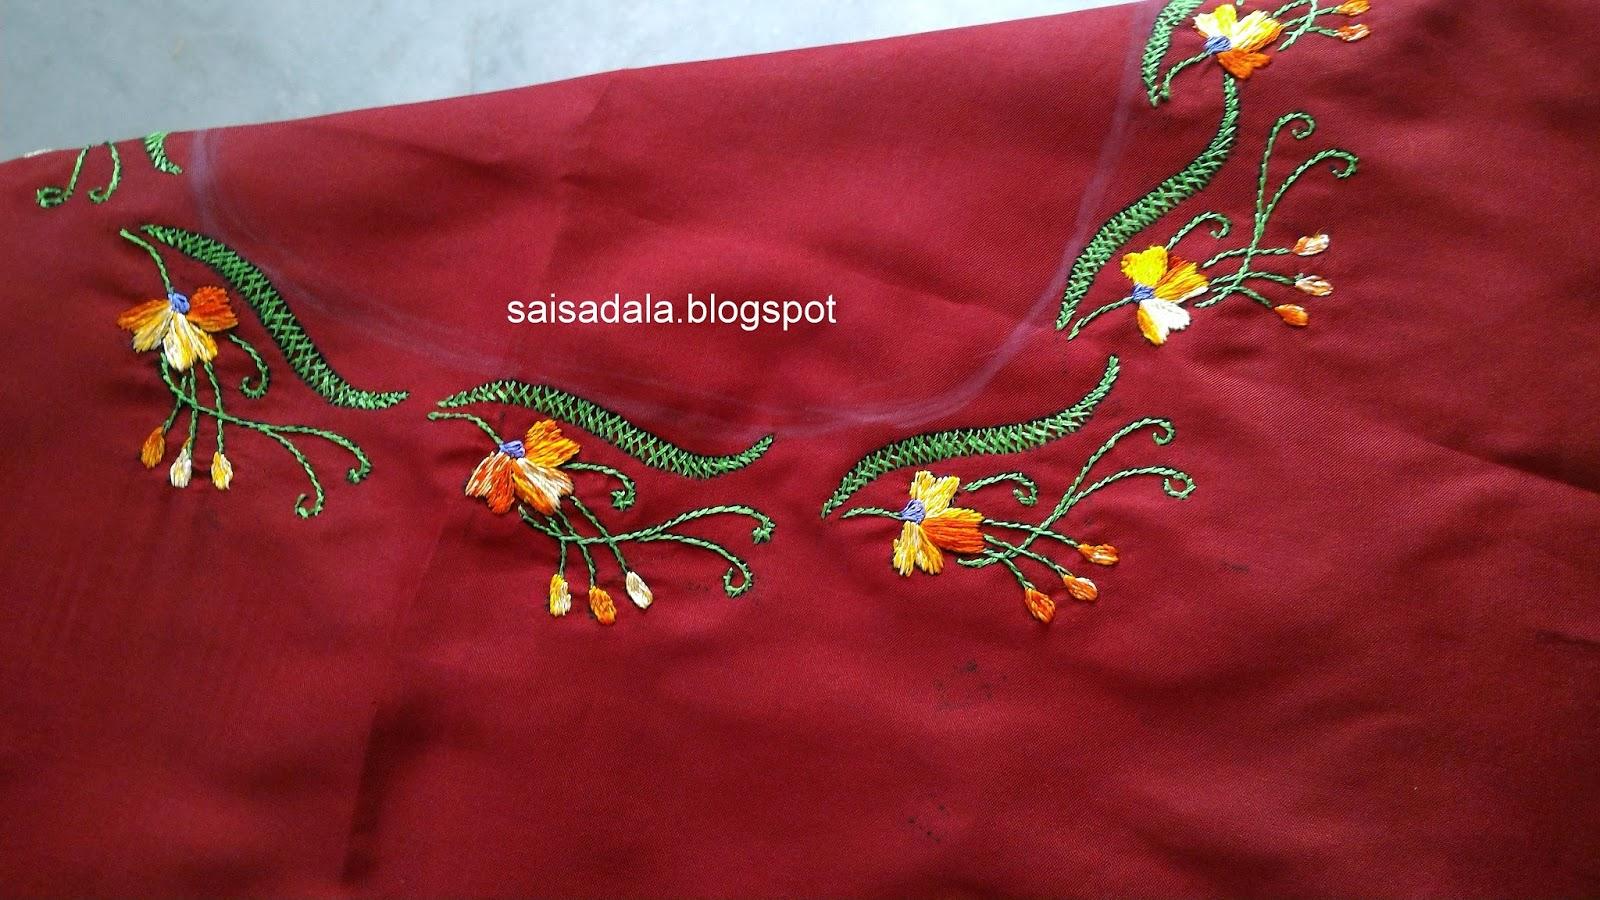 Delicate beauty sadalas embroidery – michaelieclark.